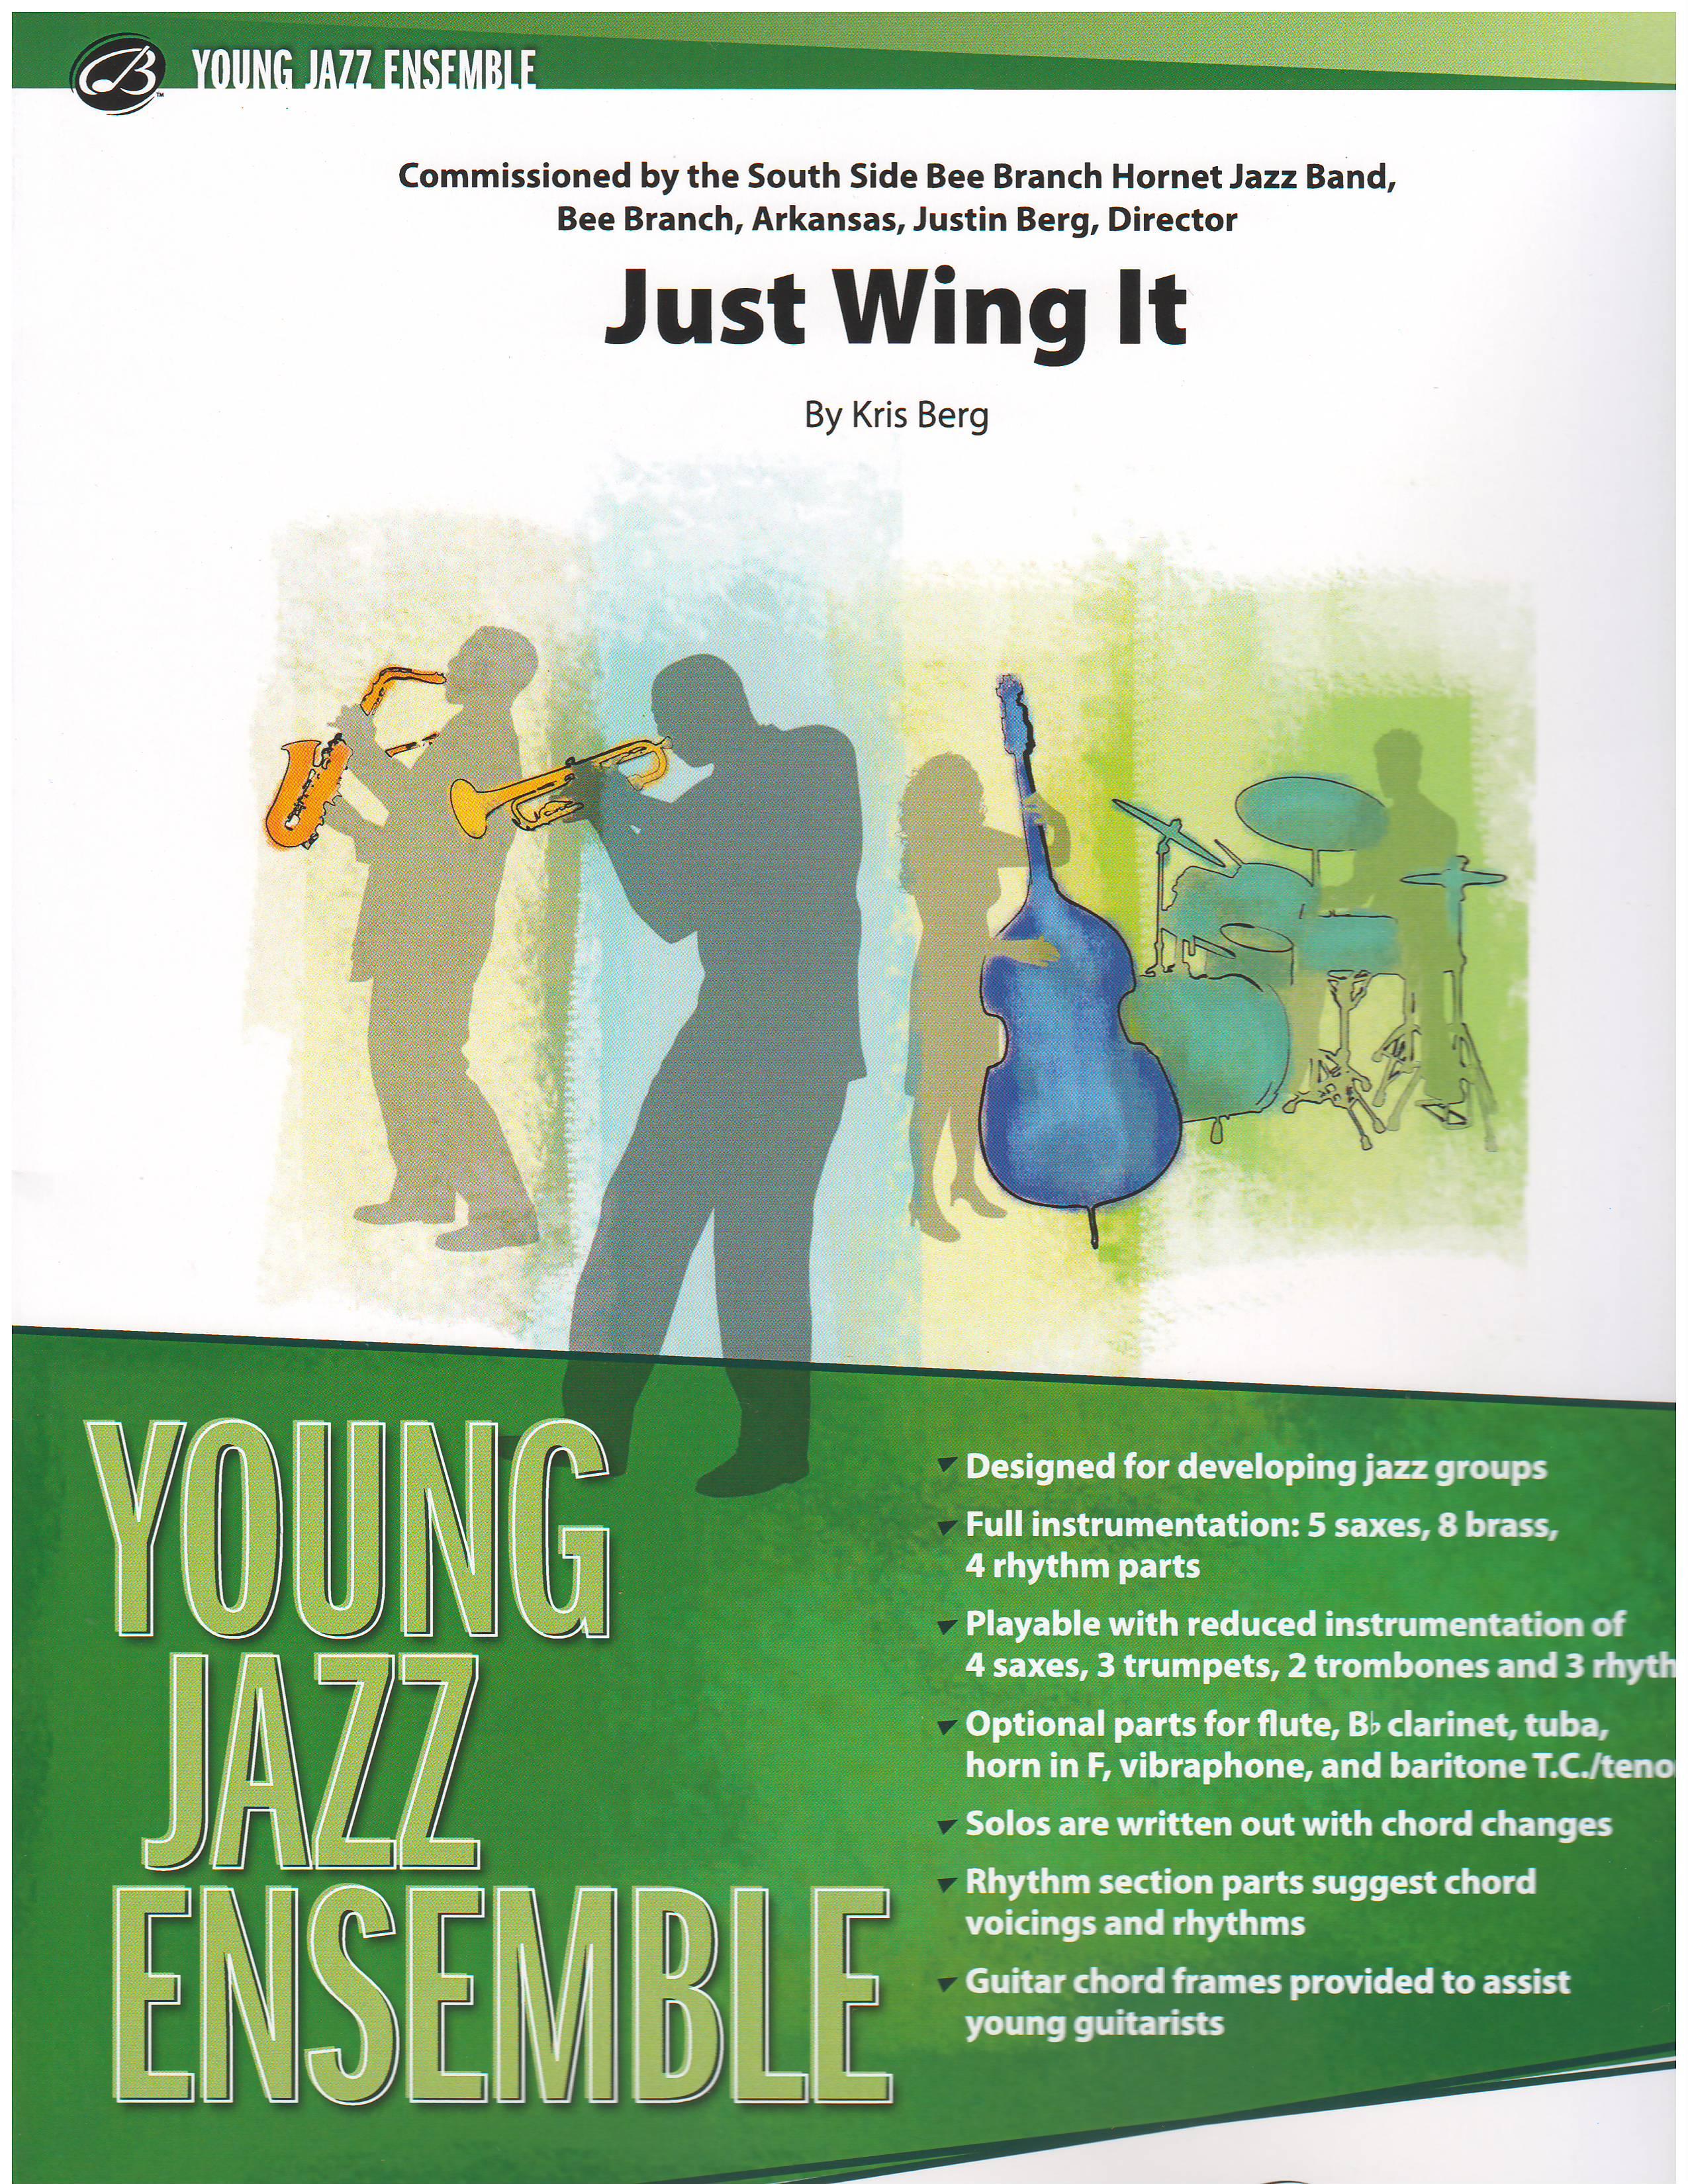 Just Wing It Funkrockfusion Growing Bands Jazz Ensemble Big